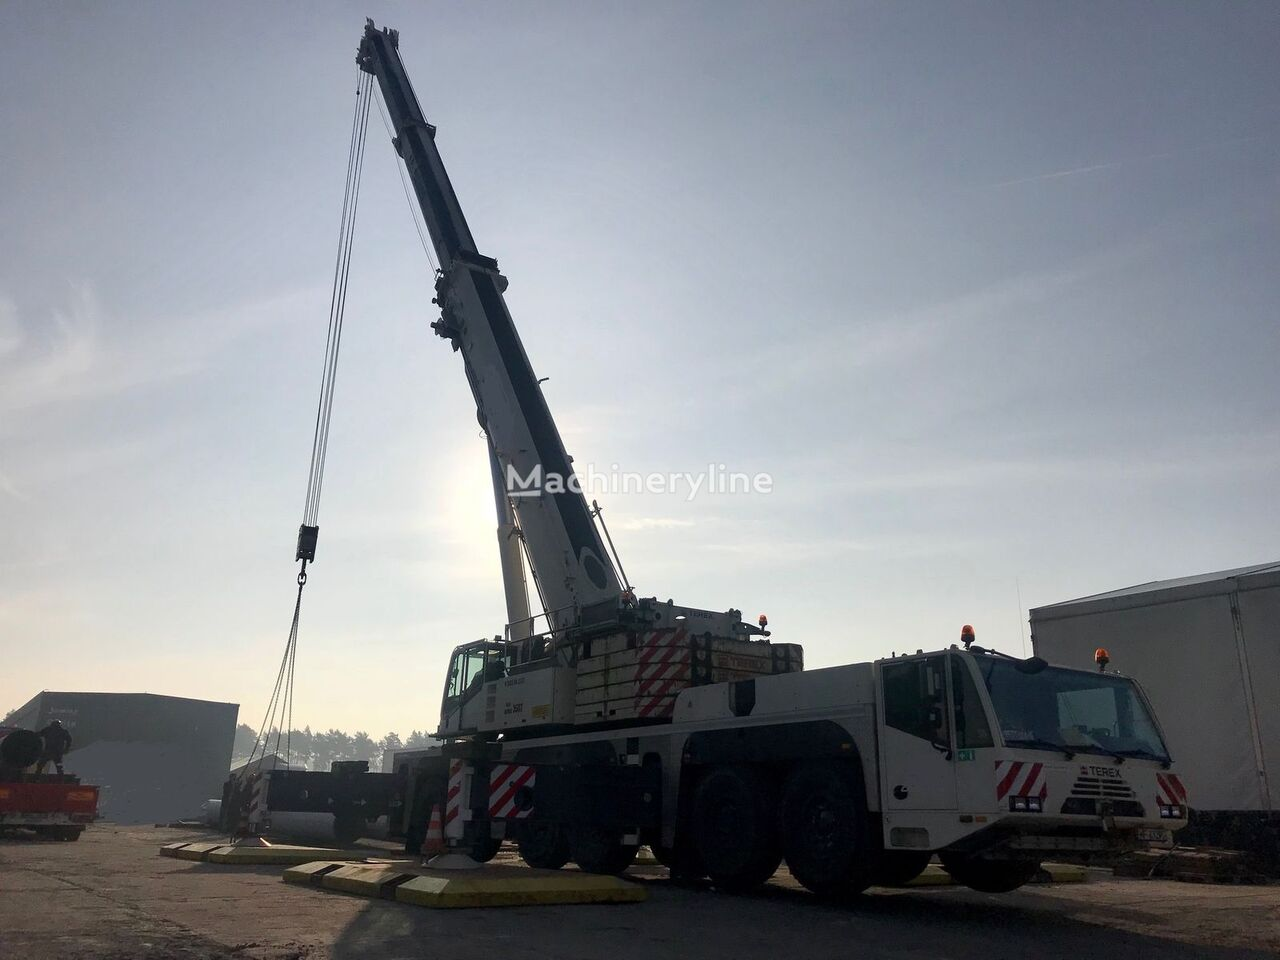 TEREX AC350/6 mobile crane